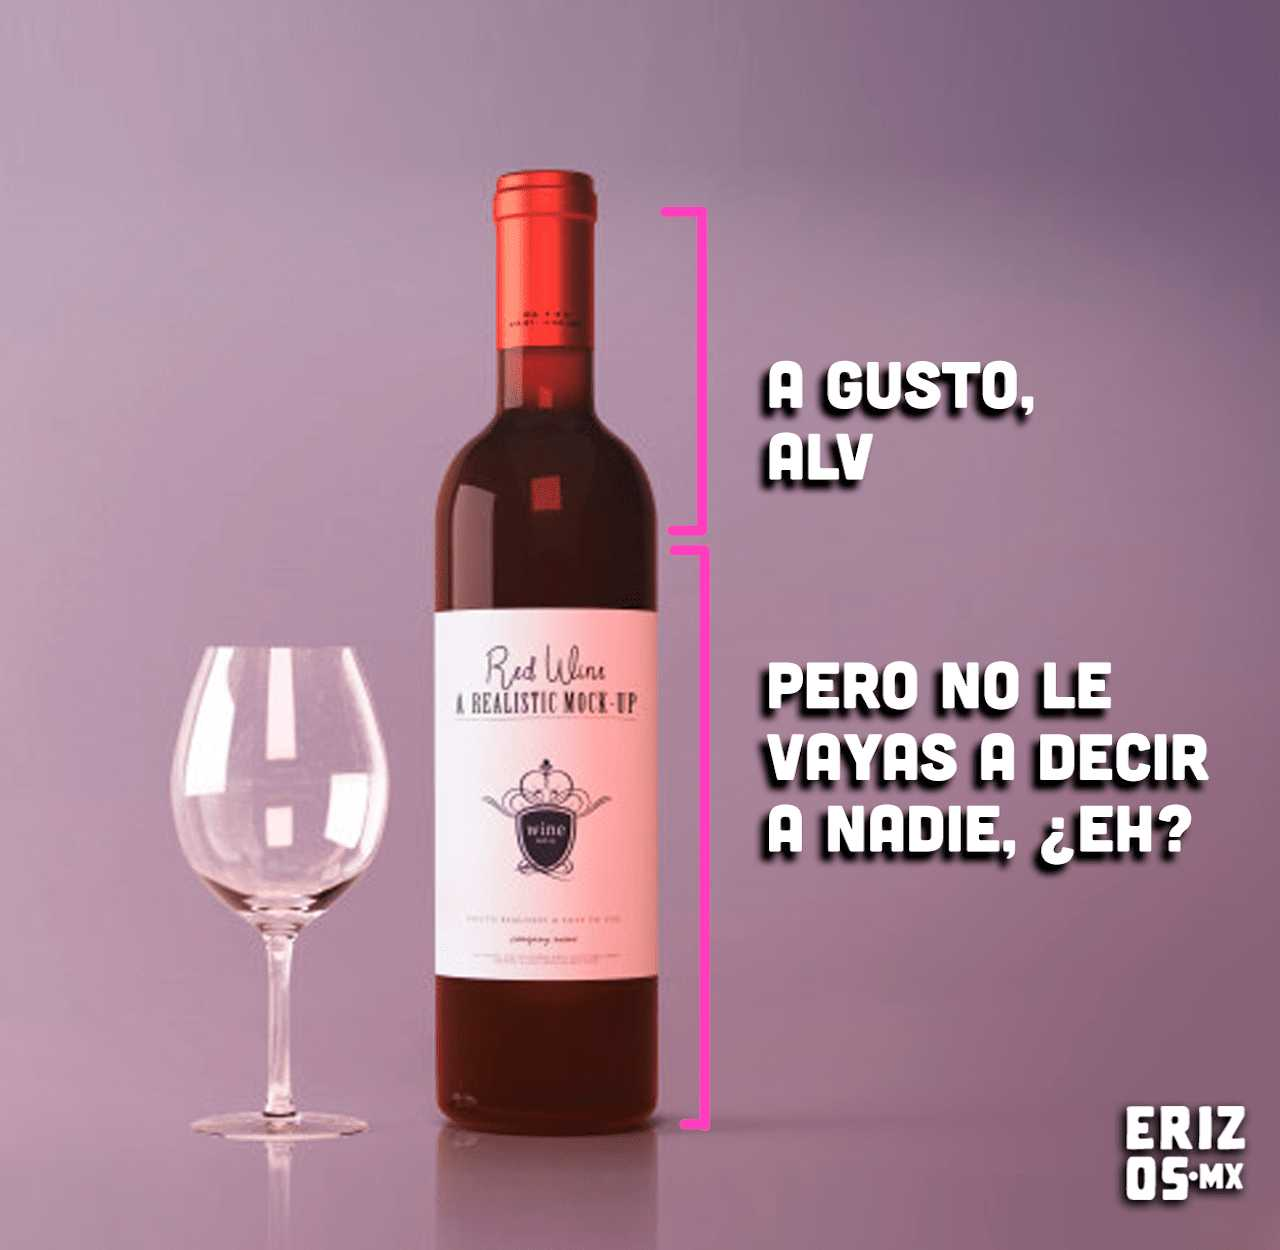 Memes de corchetes con la botella de vino